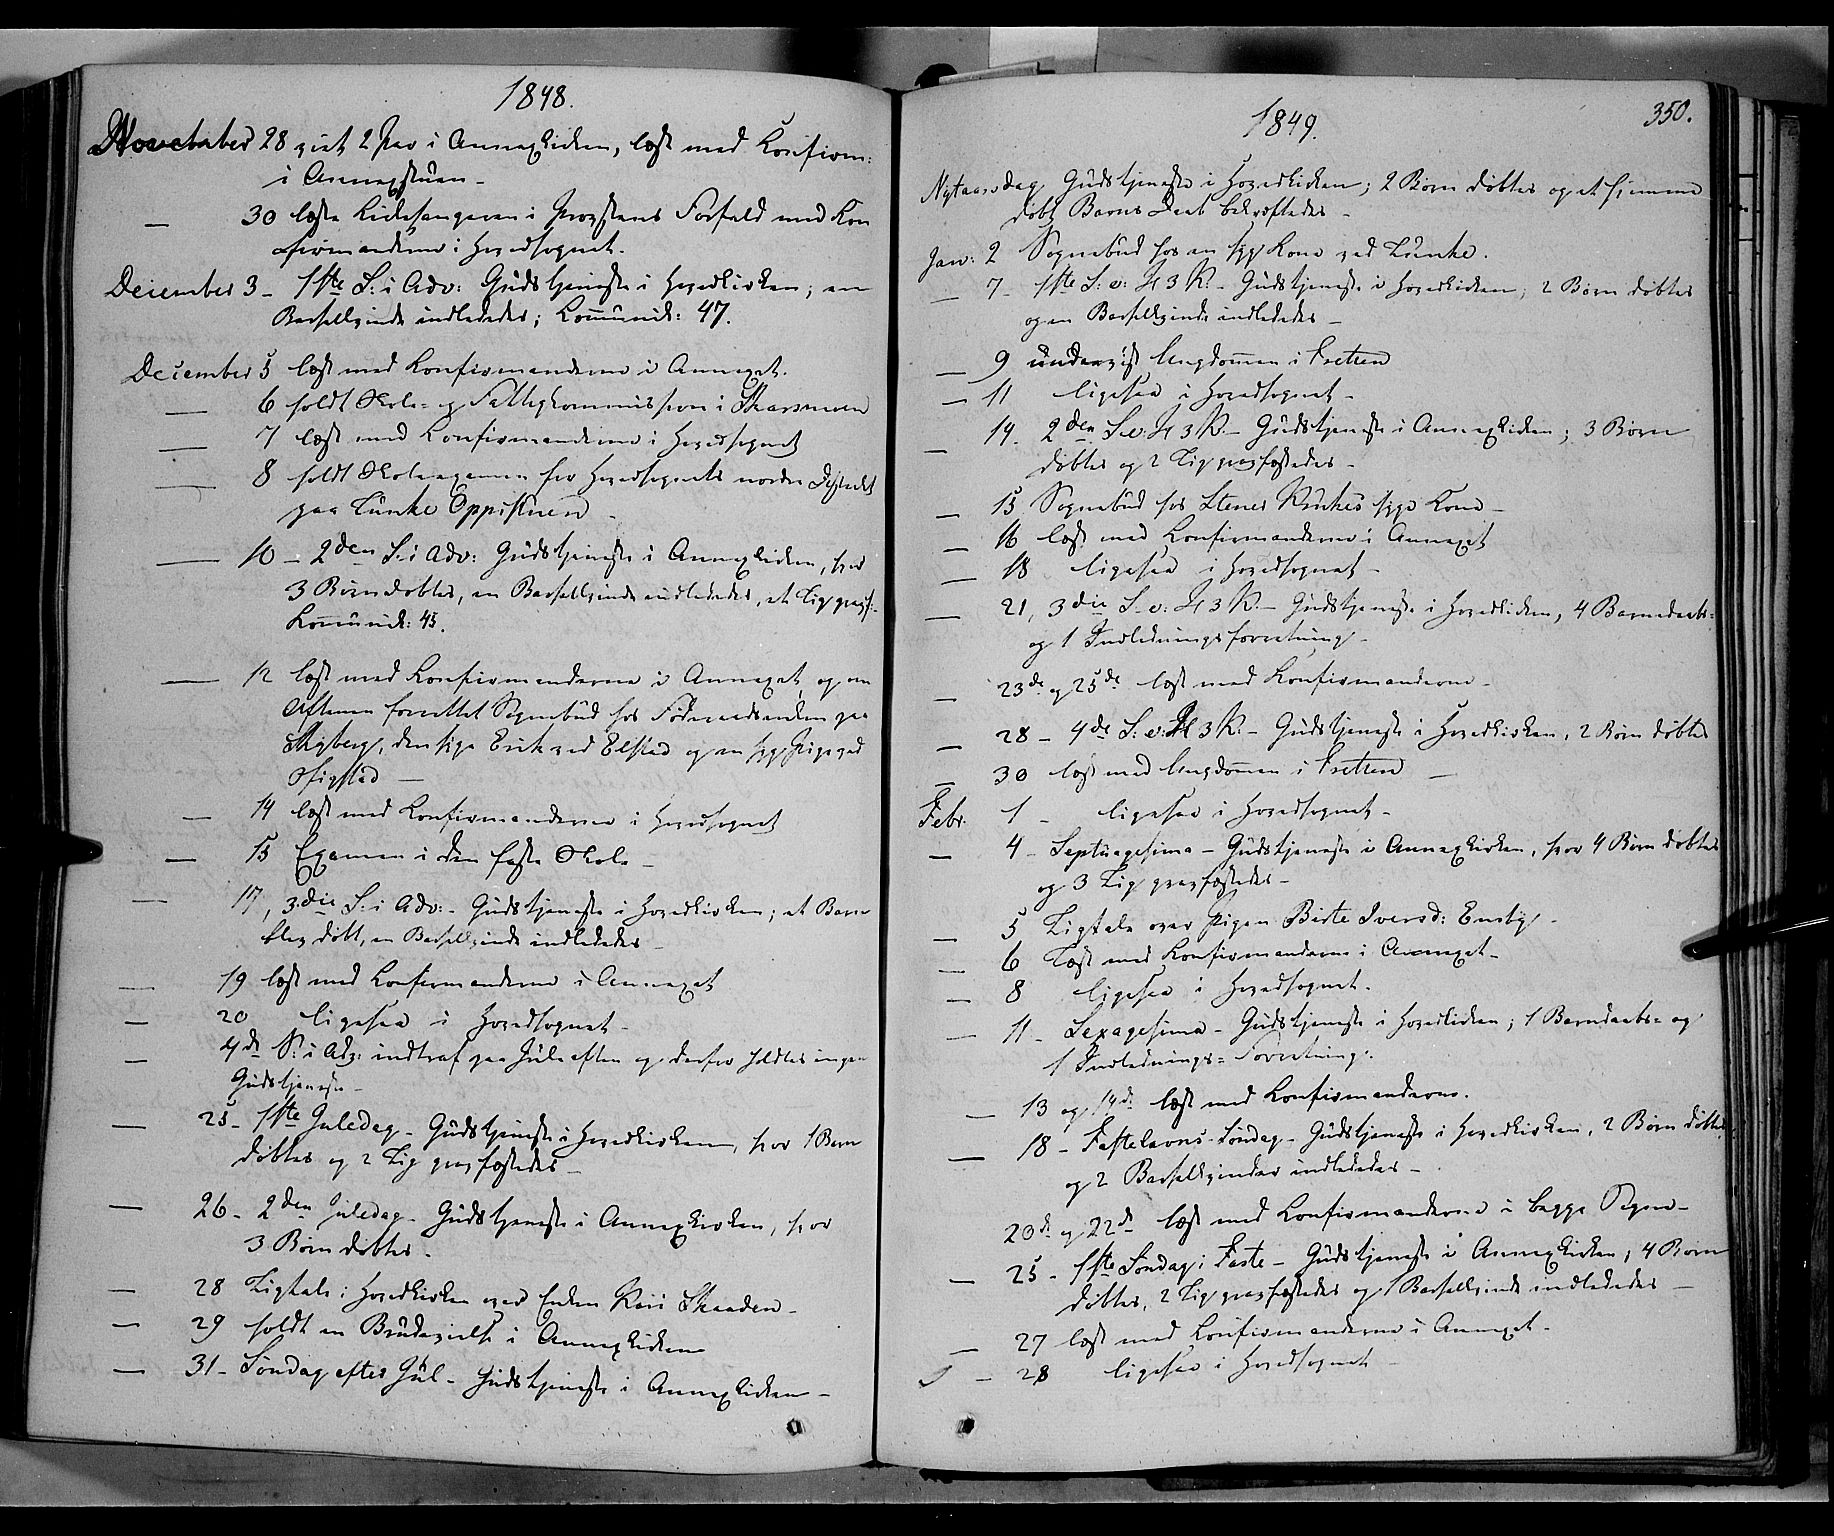 SAH, Øyer prestekontor, Ministerialbok nr. 5, 1842-1857, s. 350